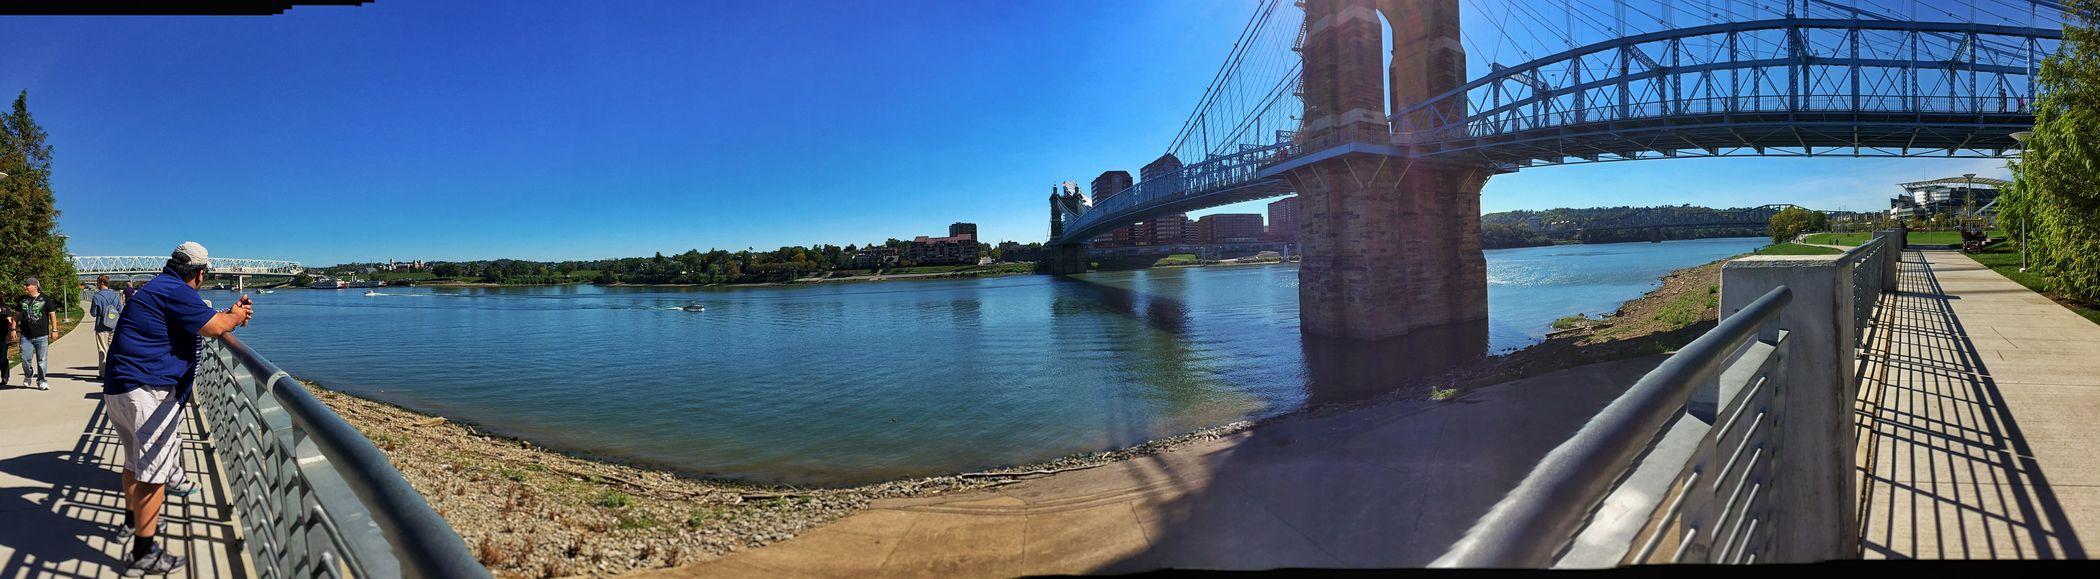 Streetphotography Bridge River View Family